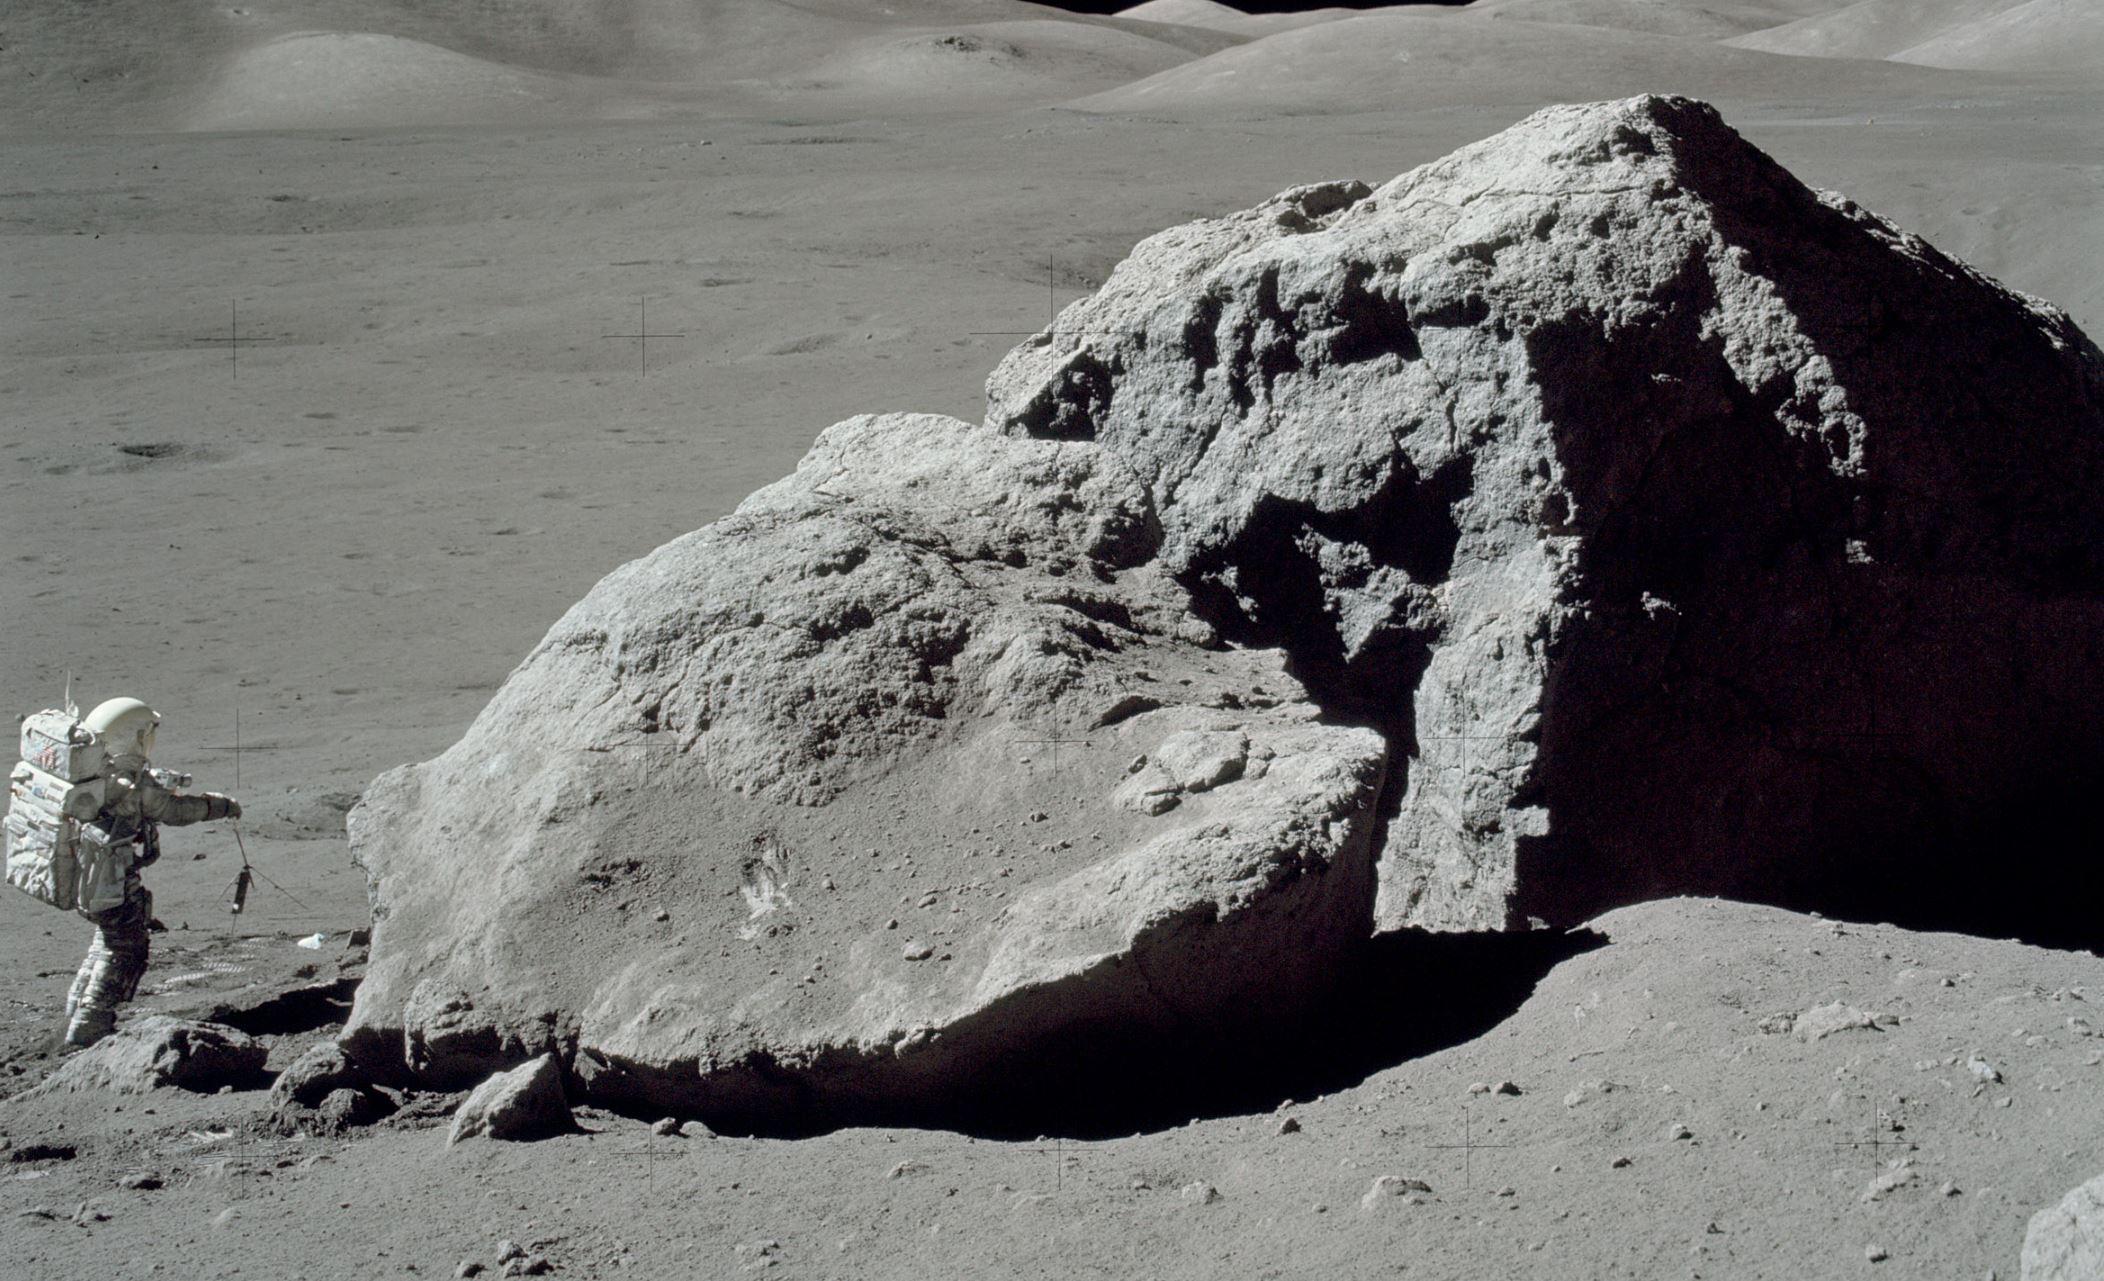 Apollo 17 astronaut Harrison H. Schmitt standing beside a boulder on the lunar surface. - Image Credit: NASA